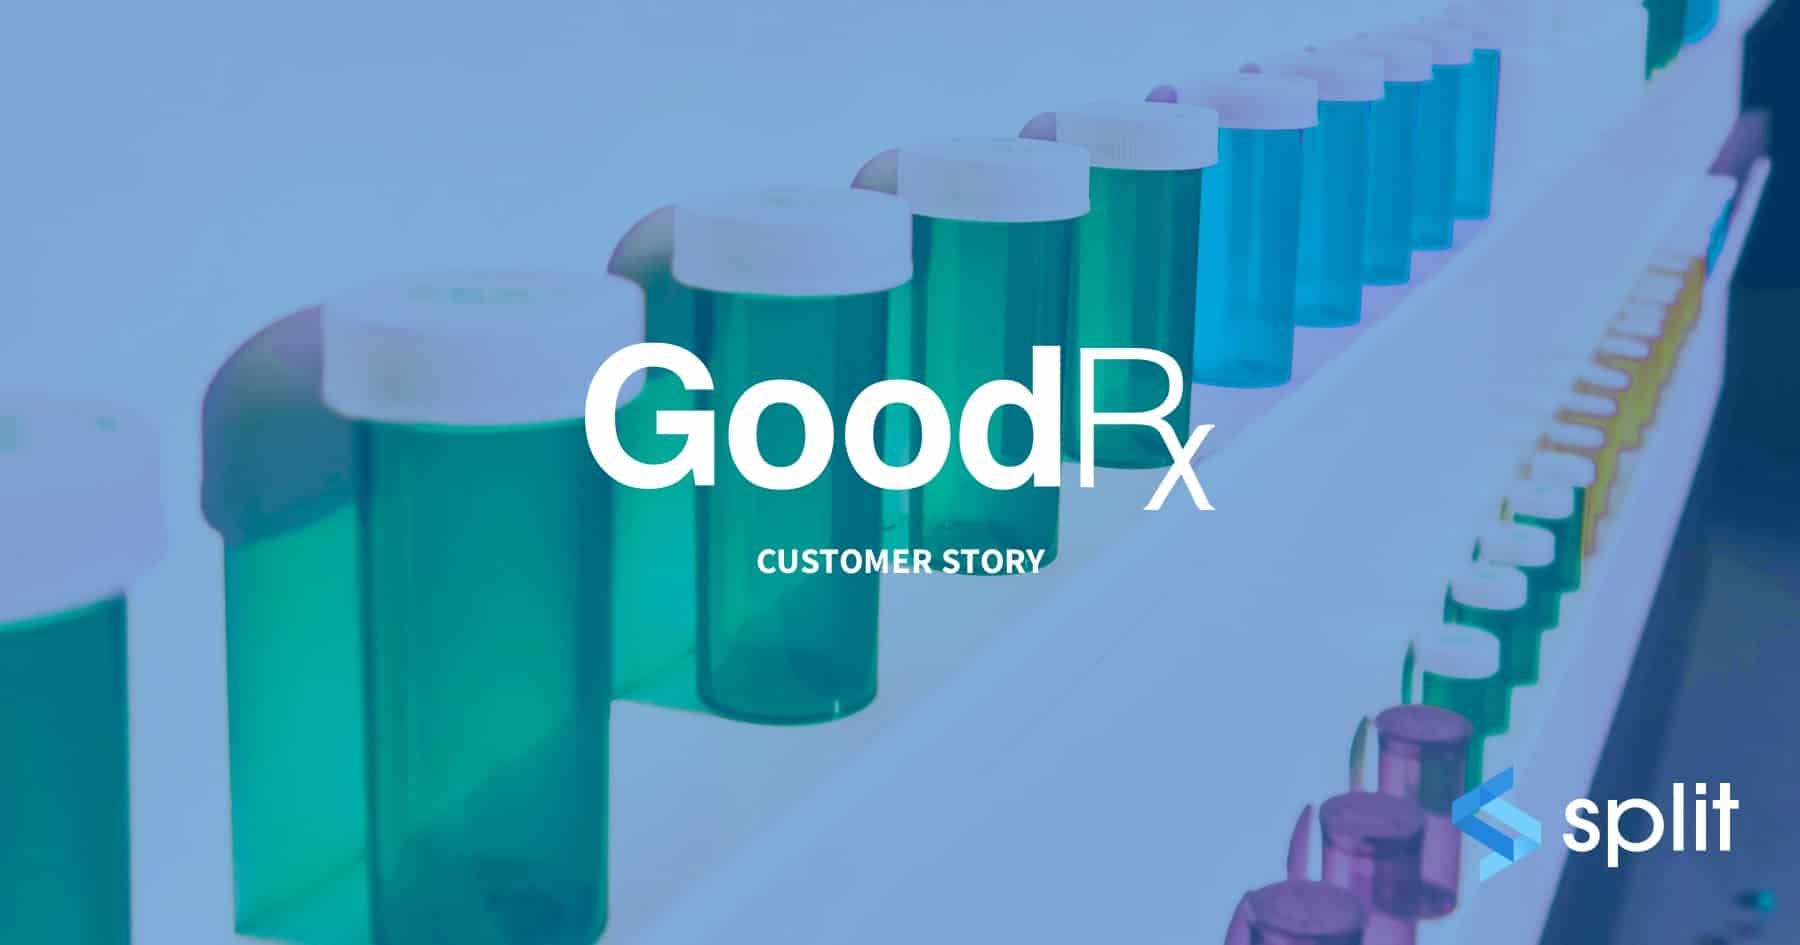 goodrx-blog